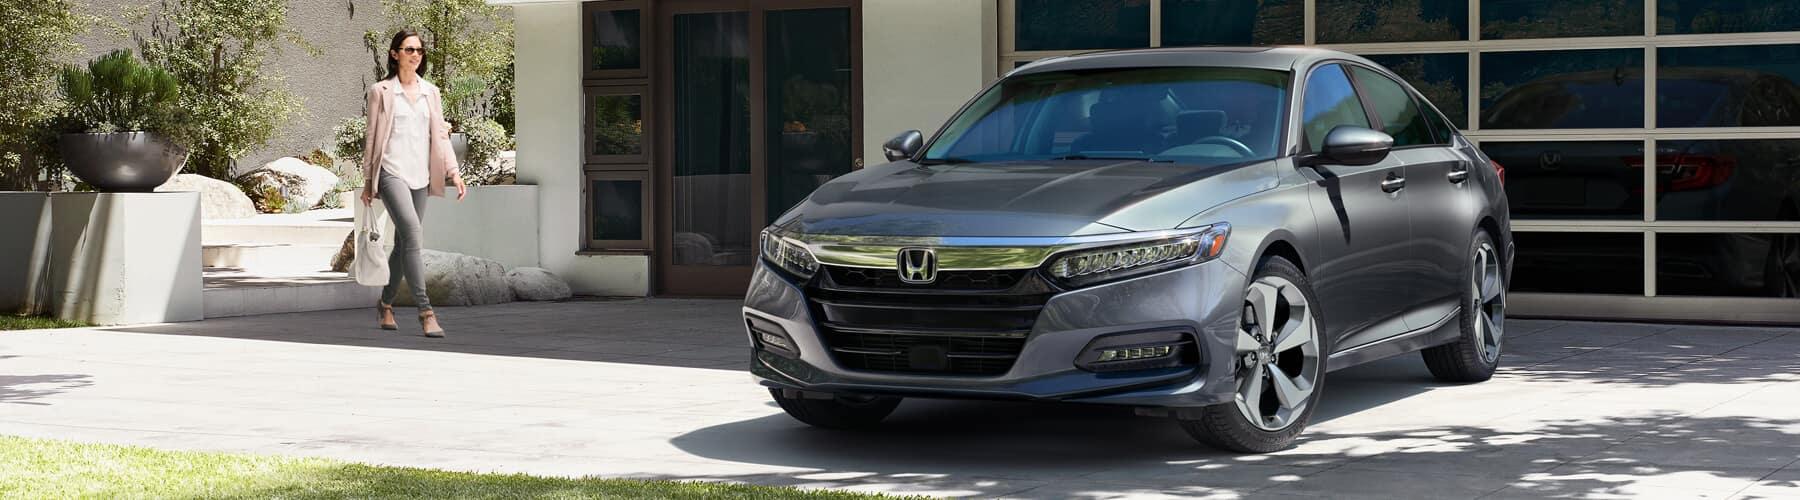 2020 Honda Accord Sedan Slider